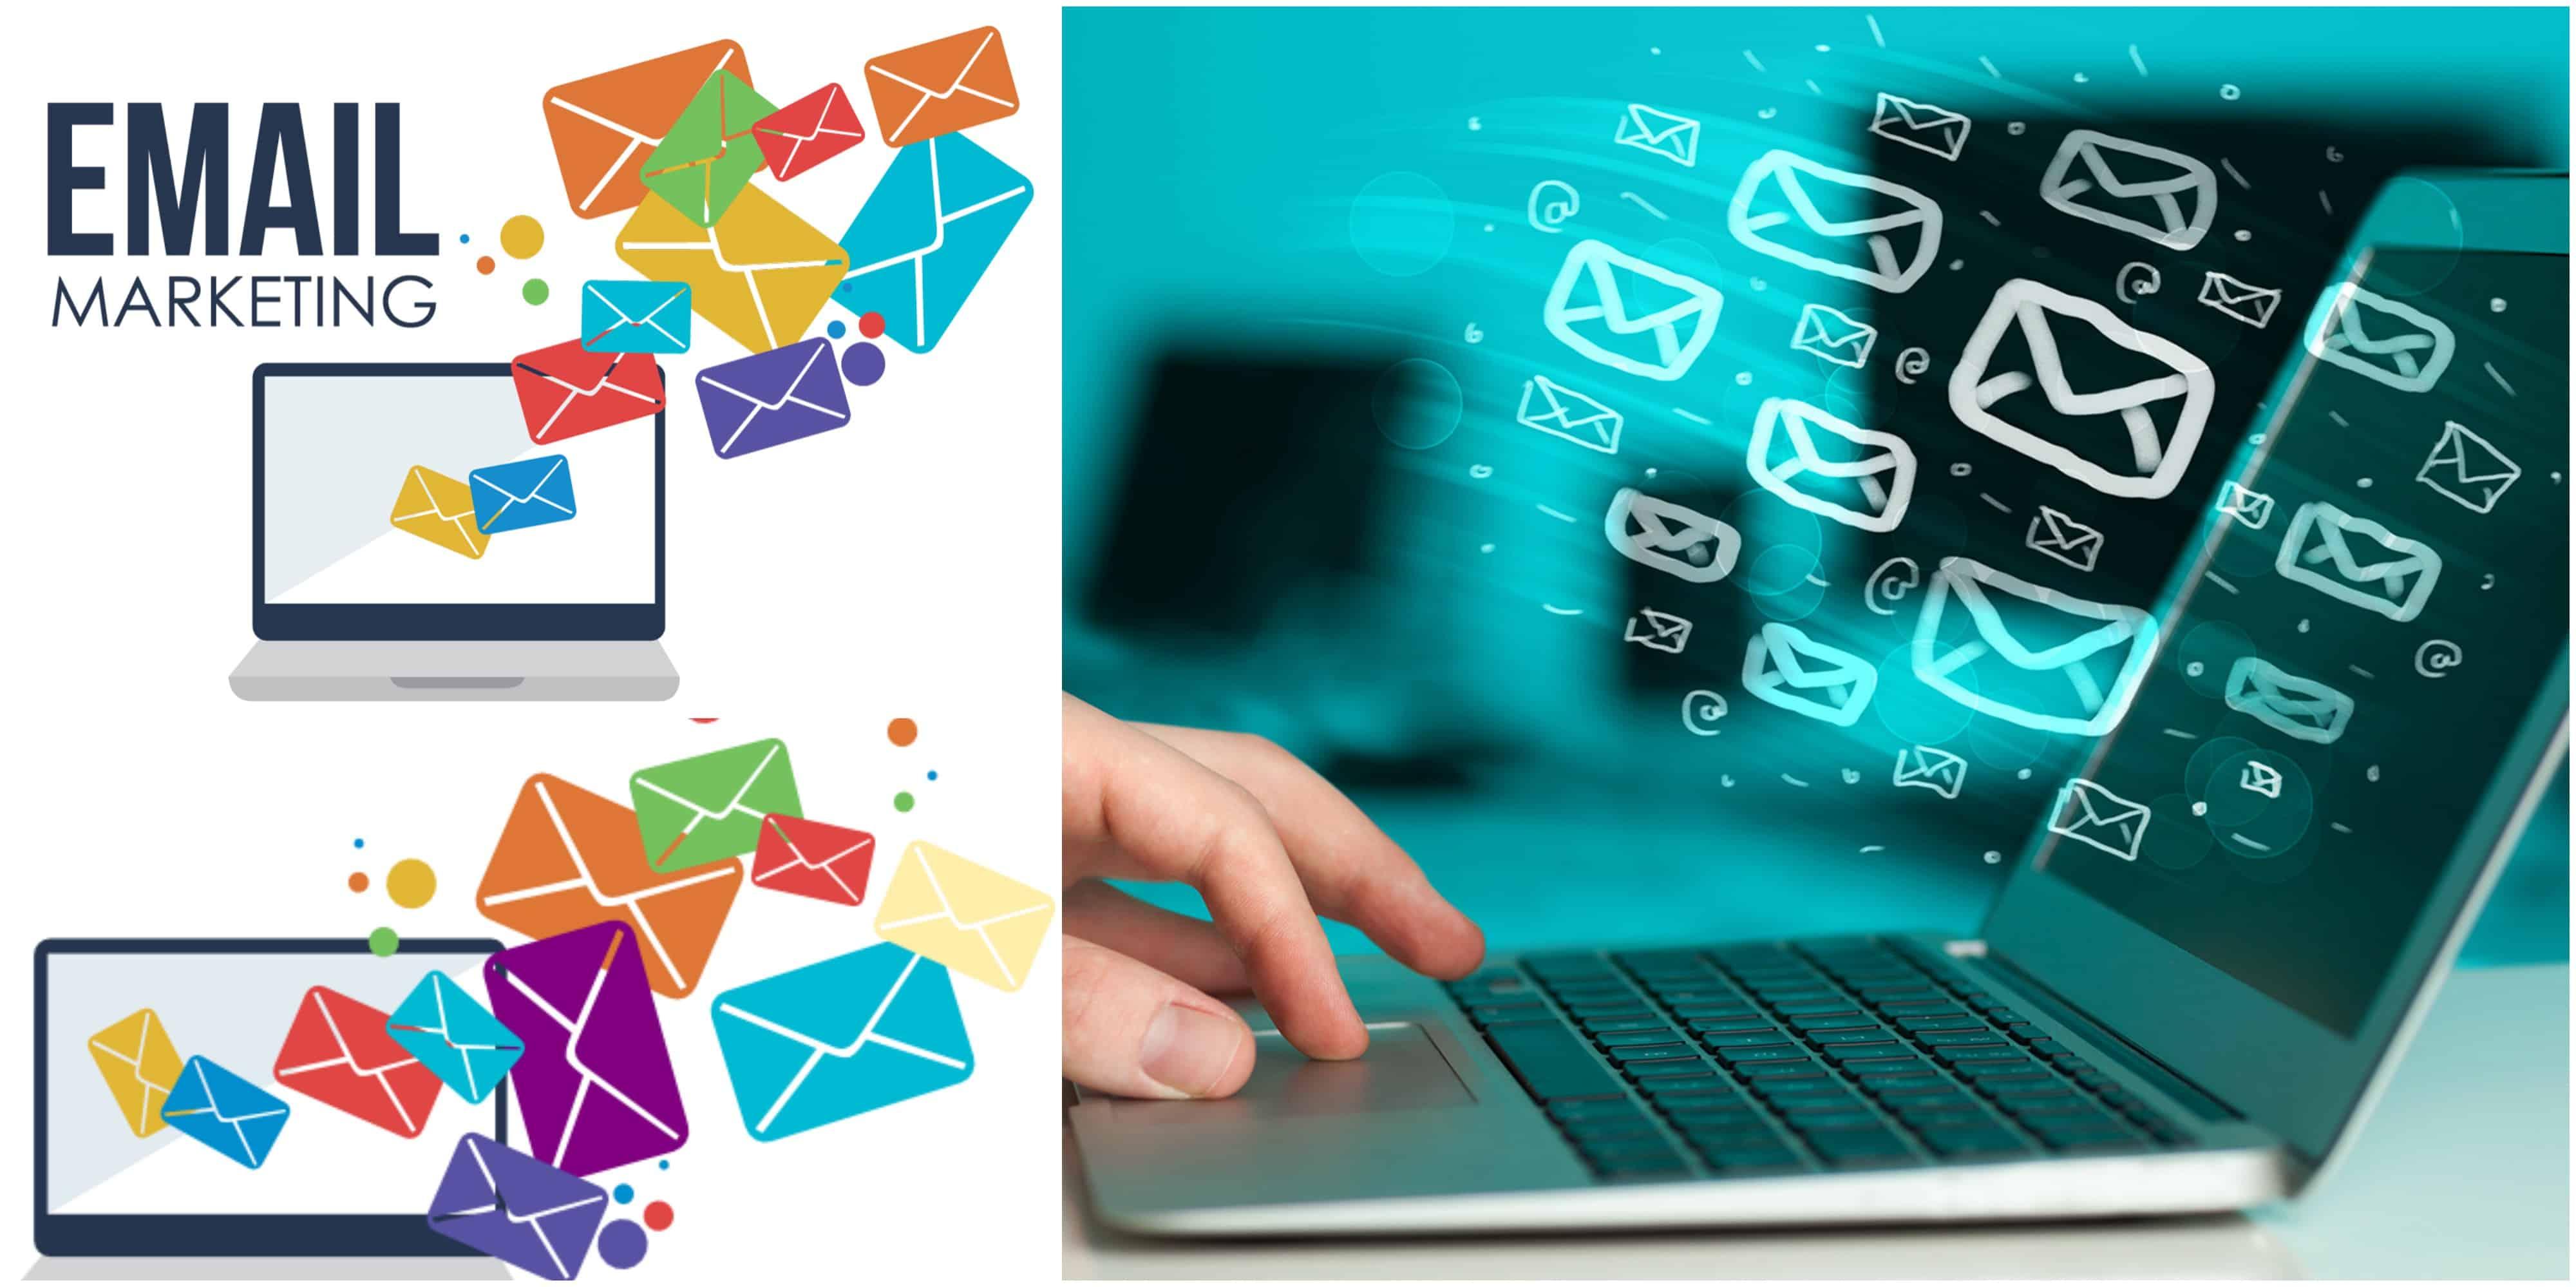 bulk email marketing emails service services bulksms india manage